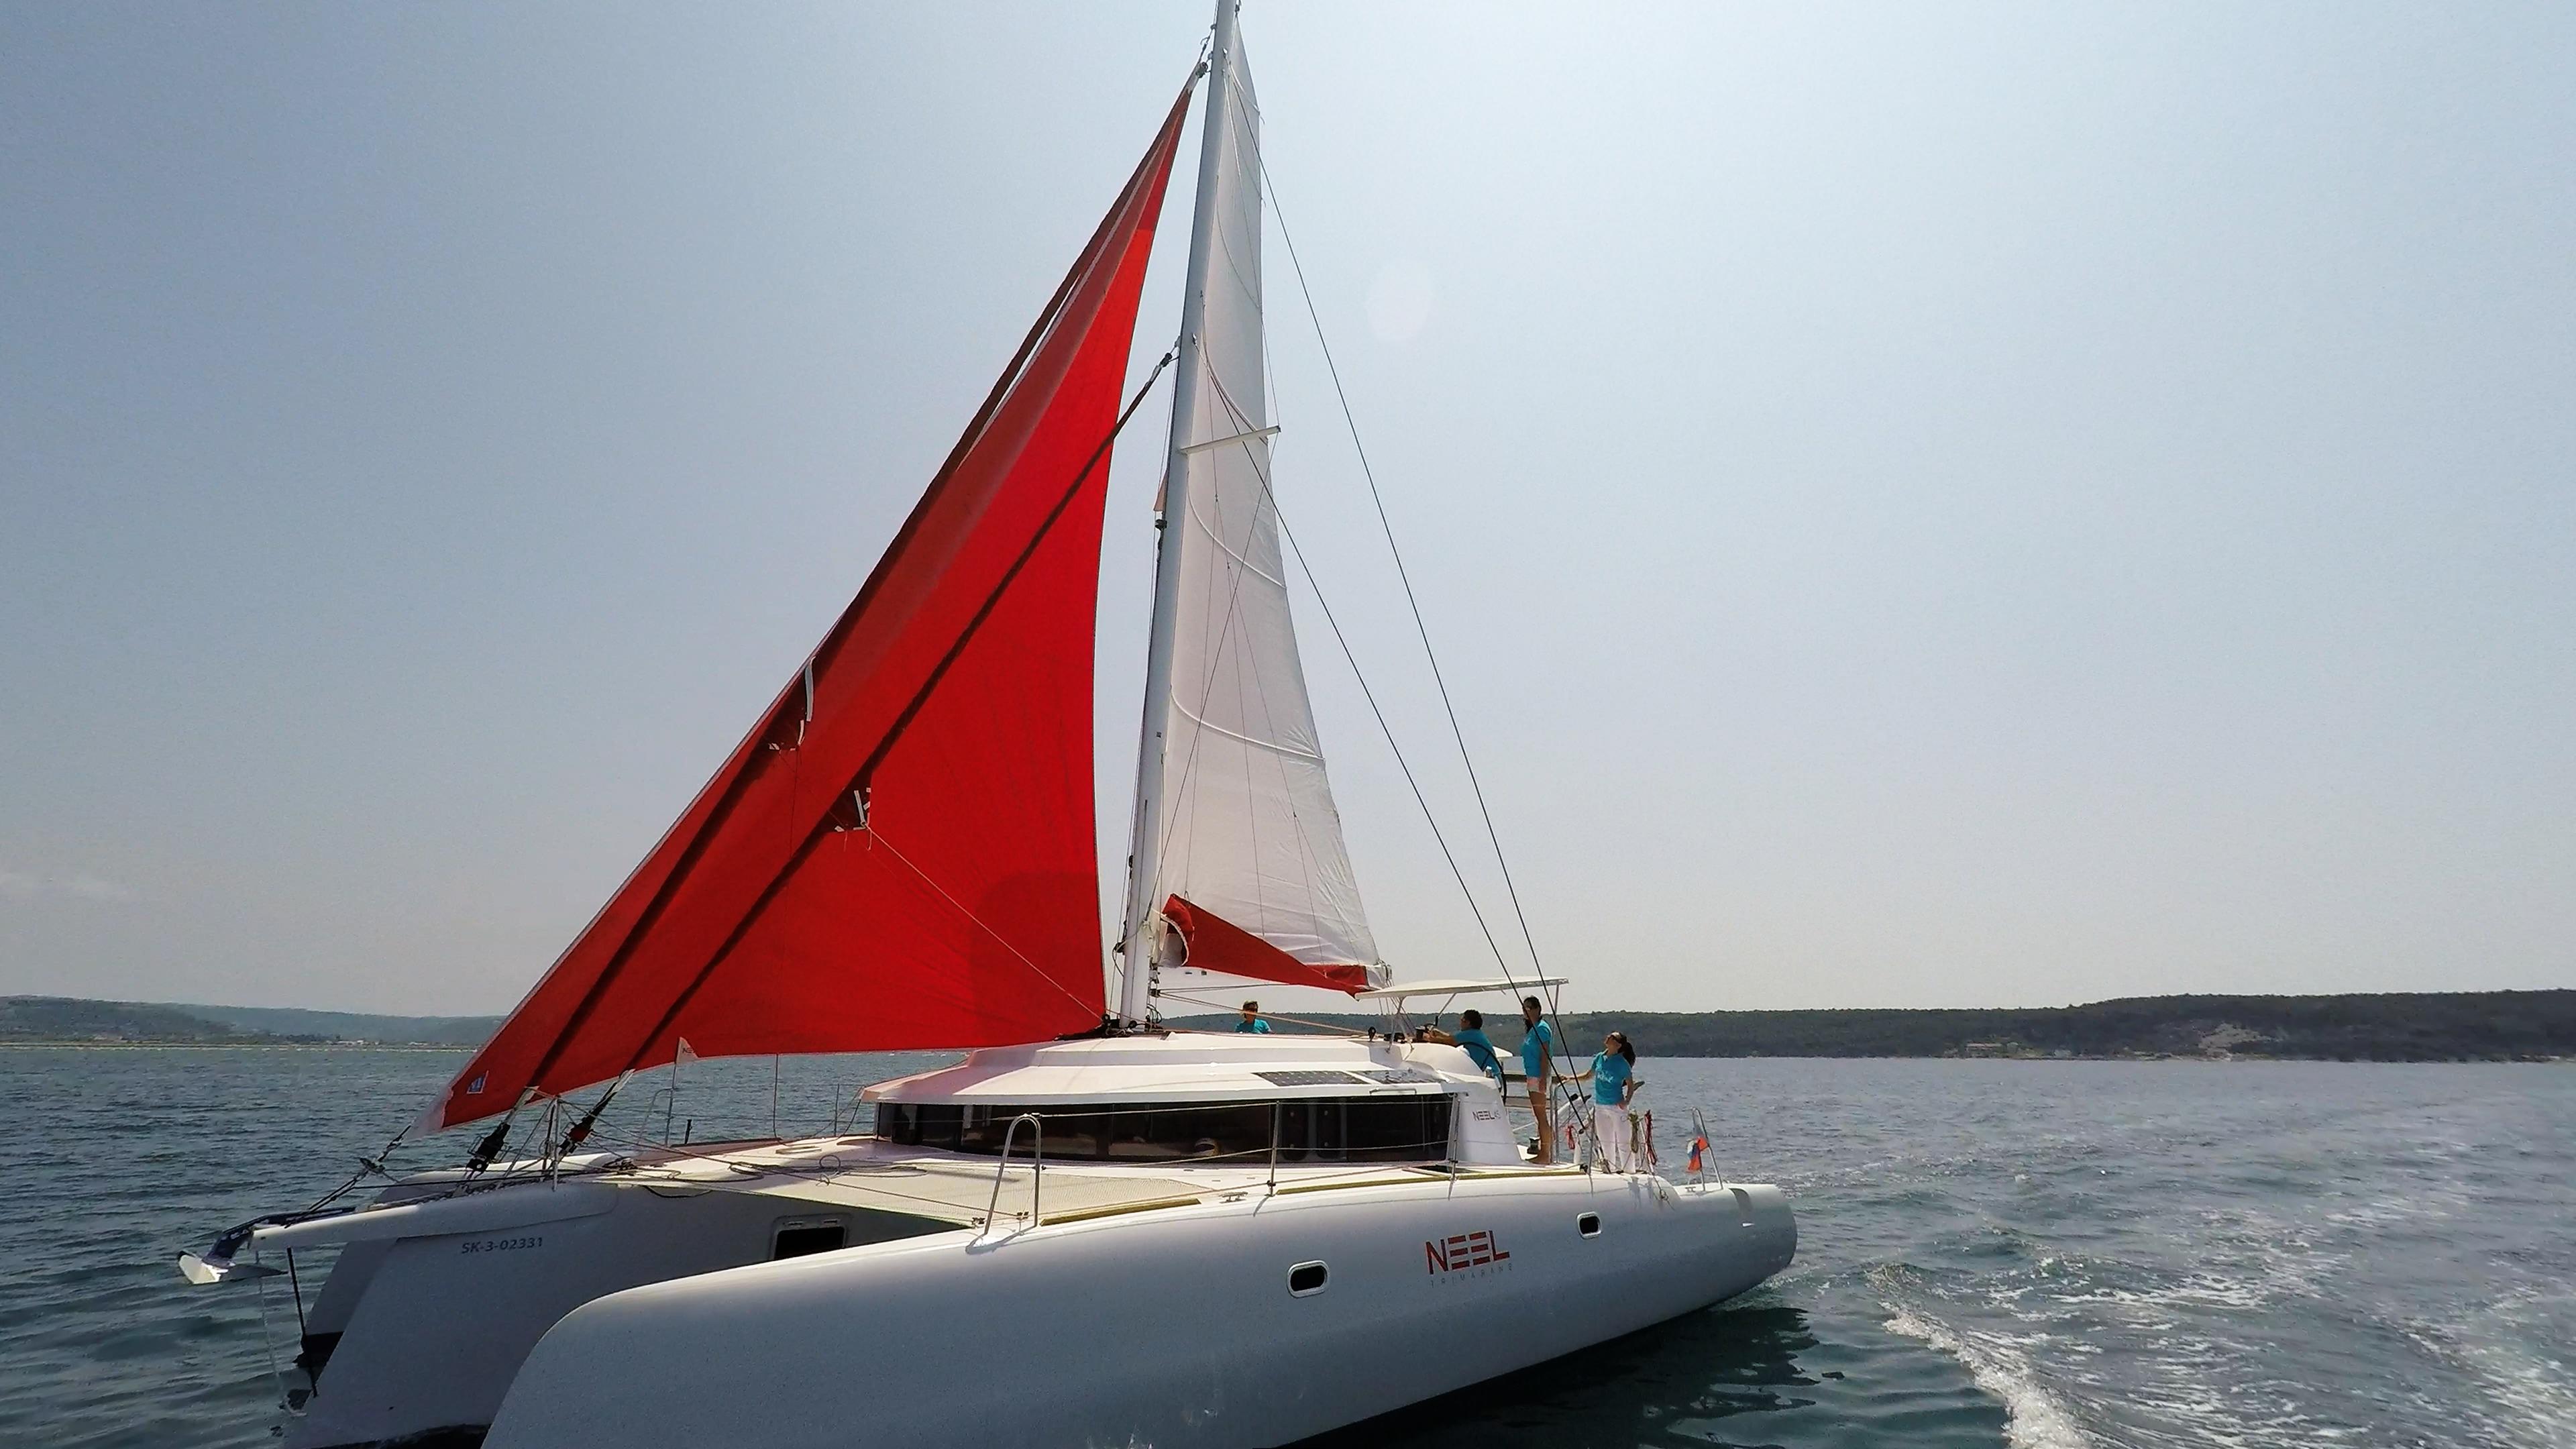 neel 45 squadra di vela